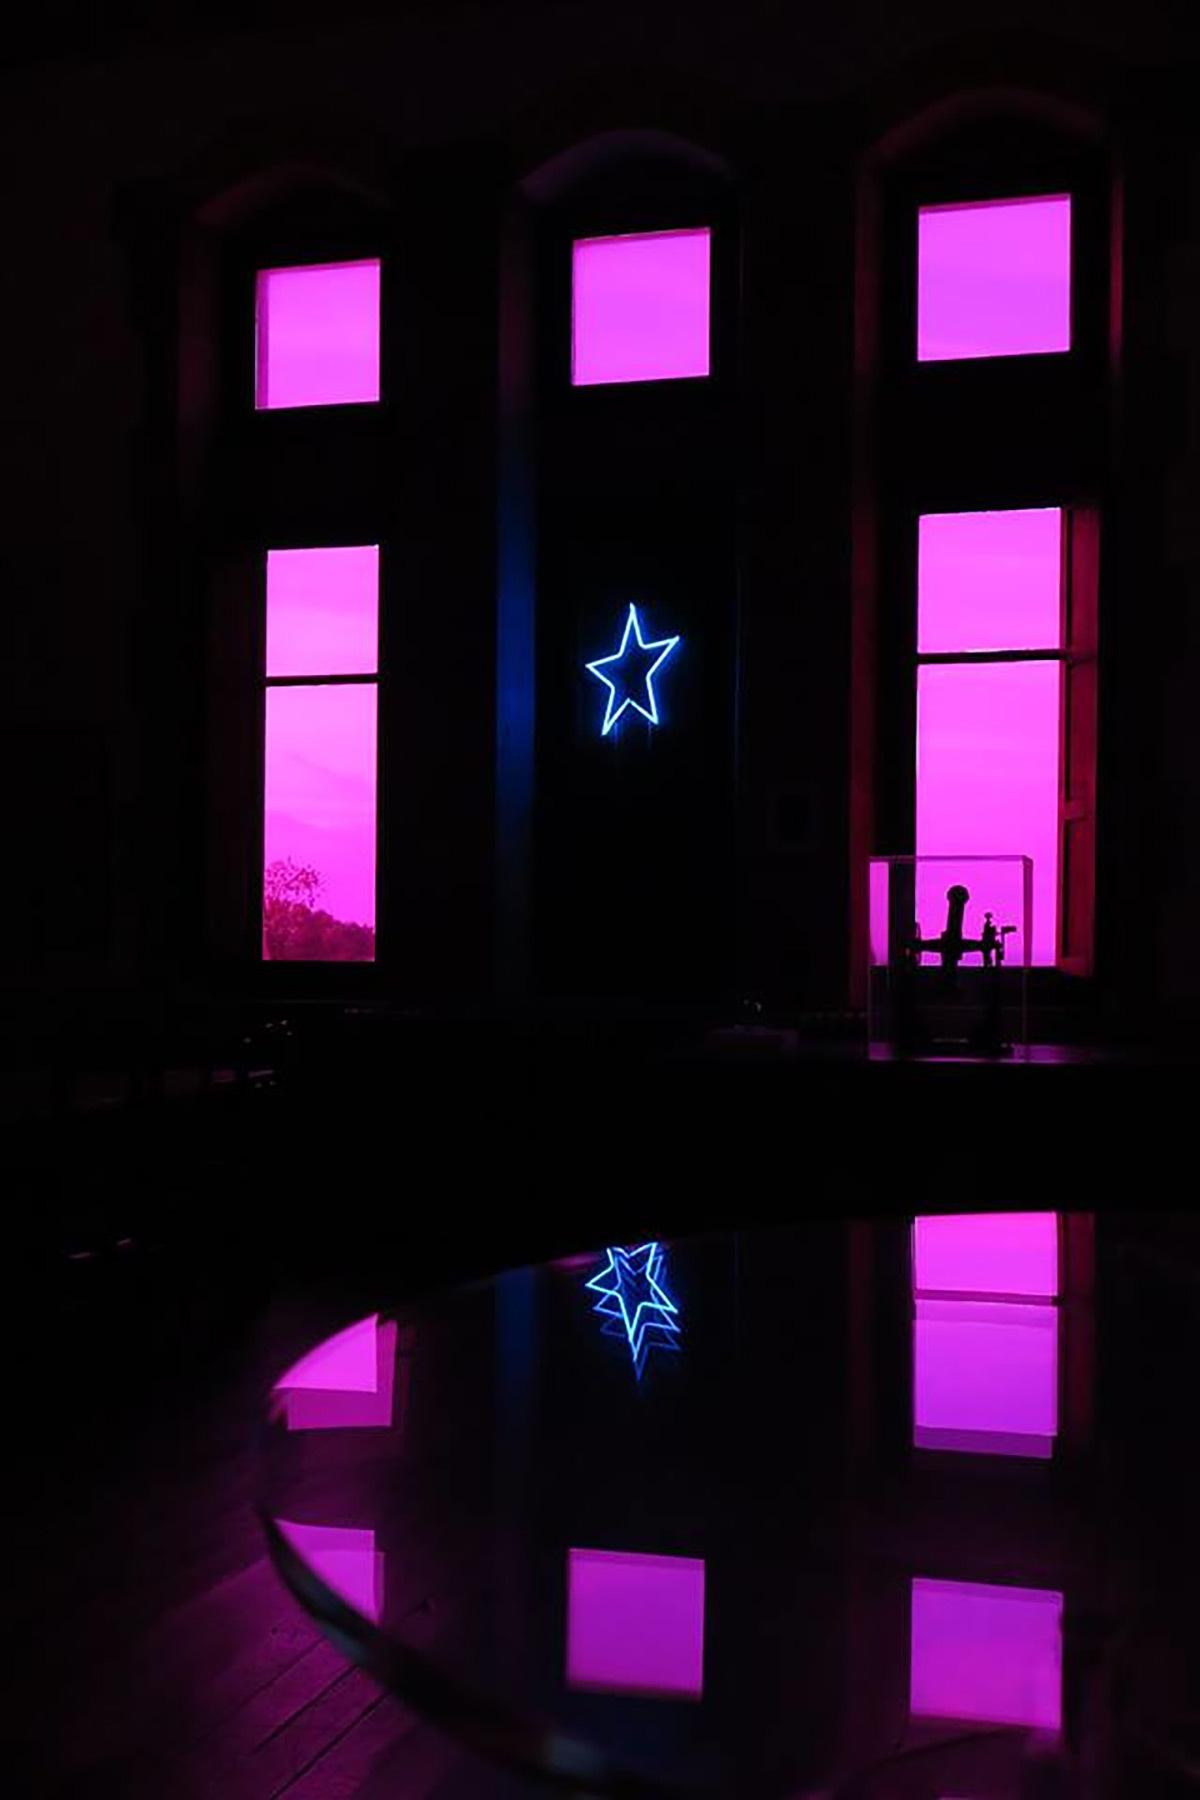 Argia, de Eric Michel - Château-Observatoire Abbadia, Hendaye, France - Perceptions 3, explorations sensibles 2016 - Photo : Céline Davadan